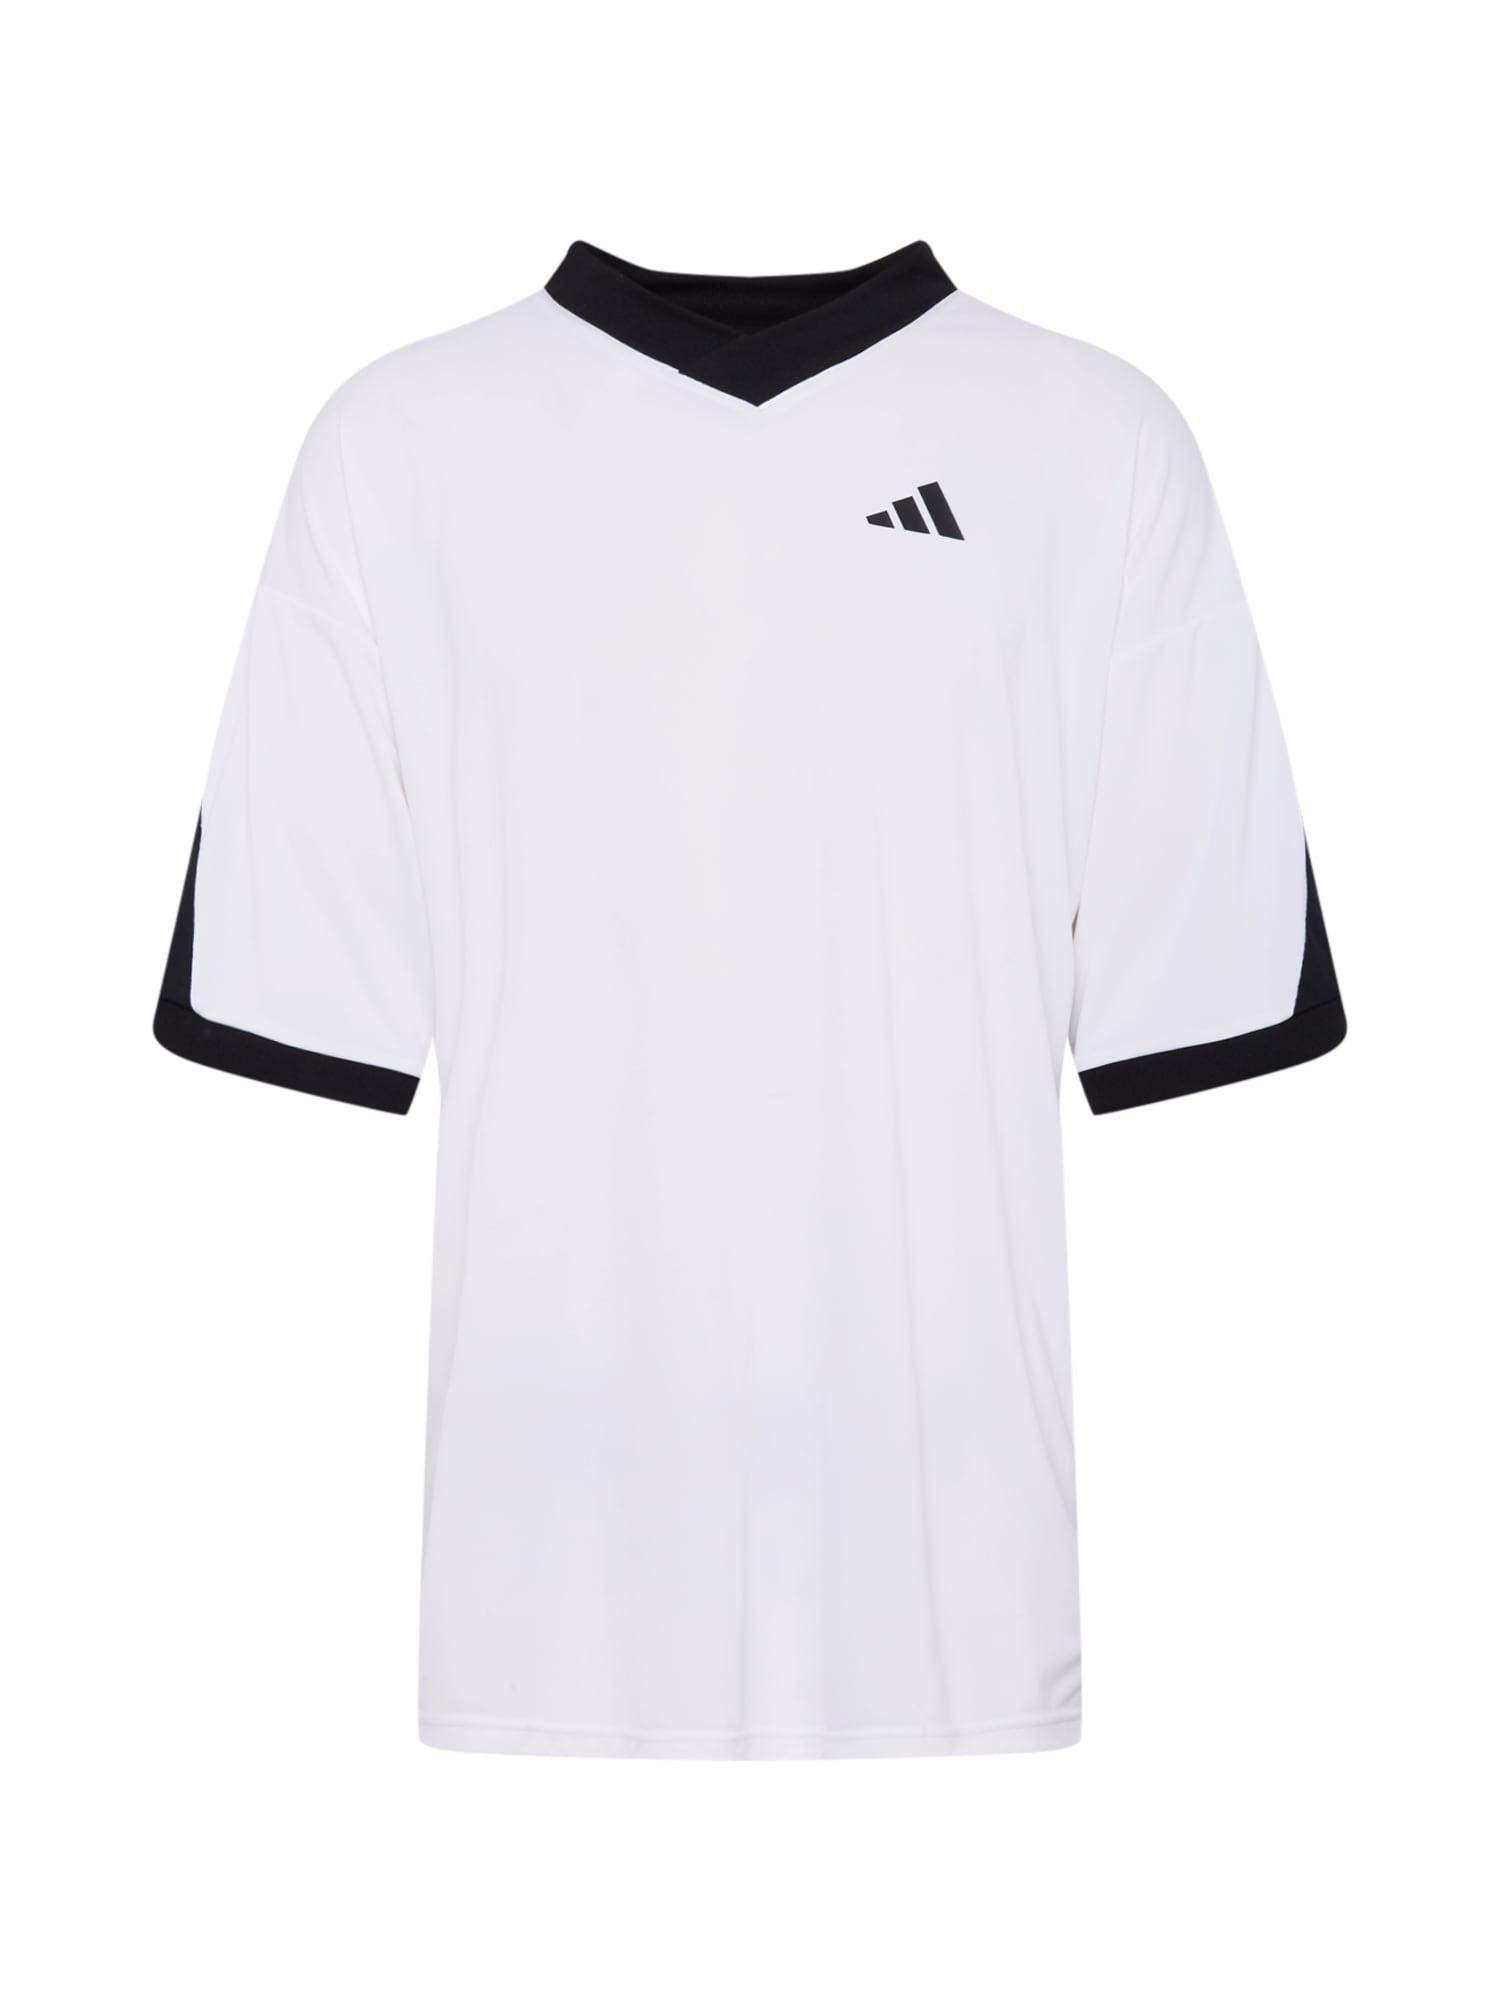 ADIDAS PERFORMANCE Funkční tričko 'Urban Foot'  černá / bílá